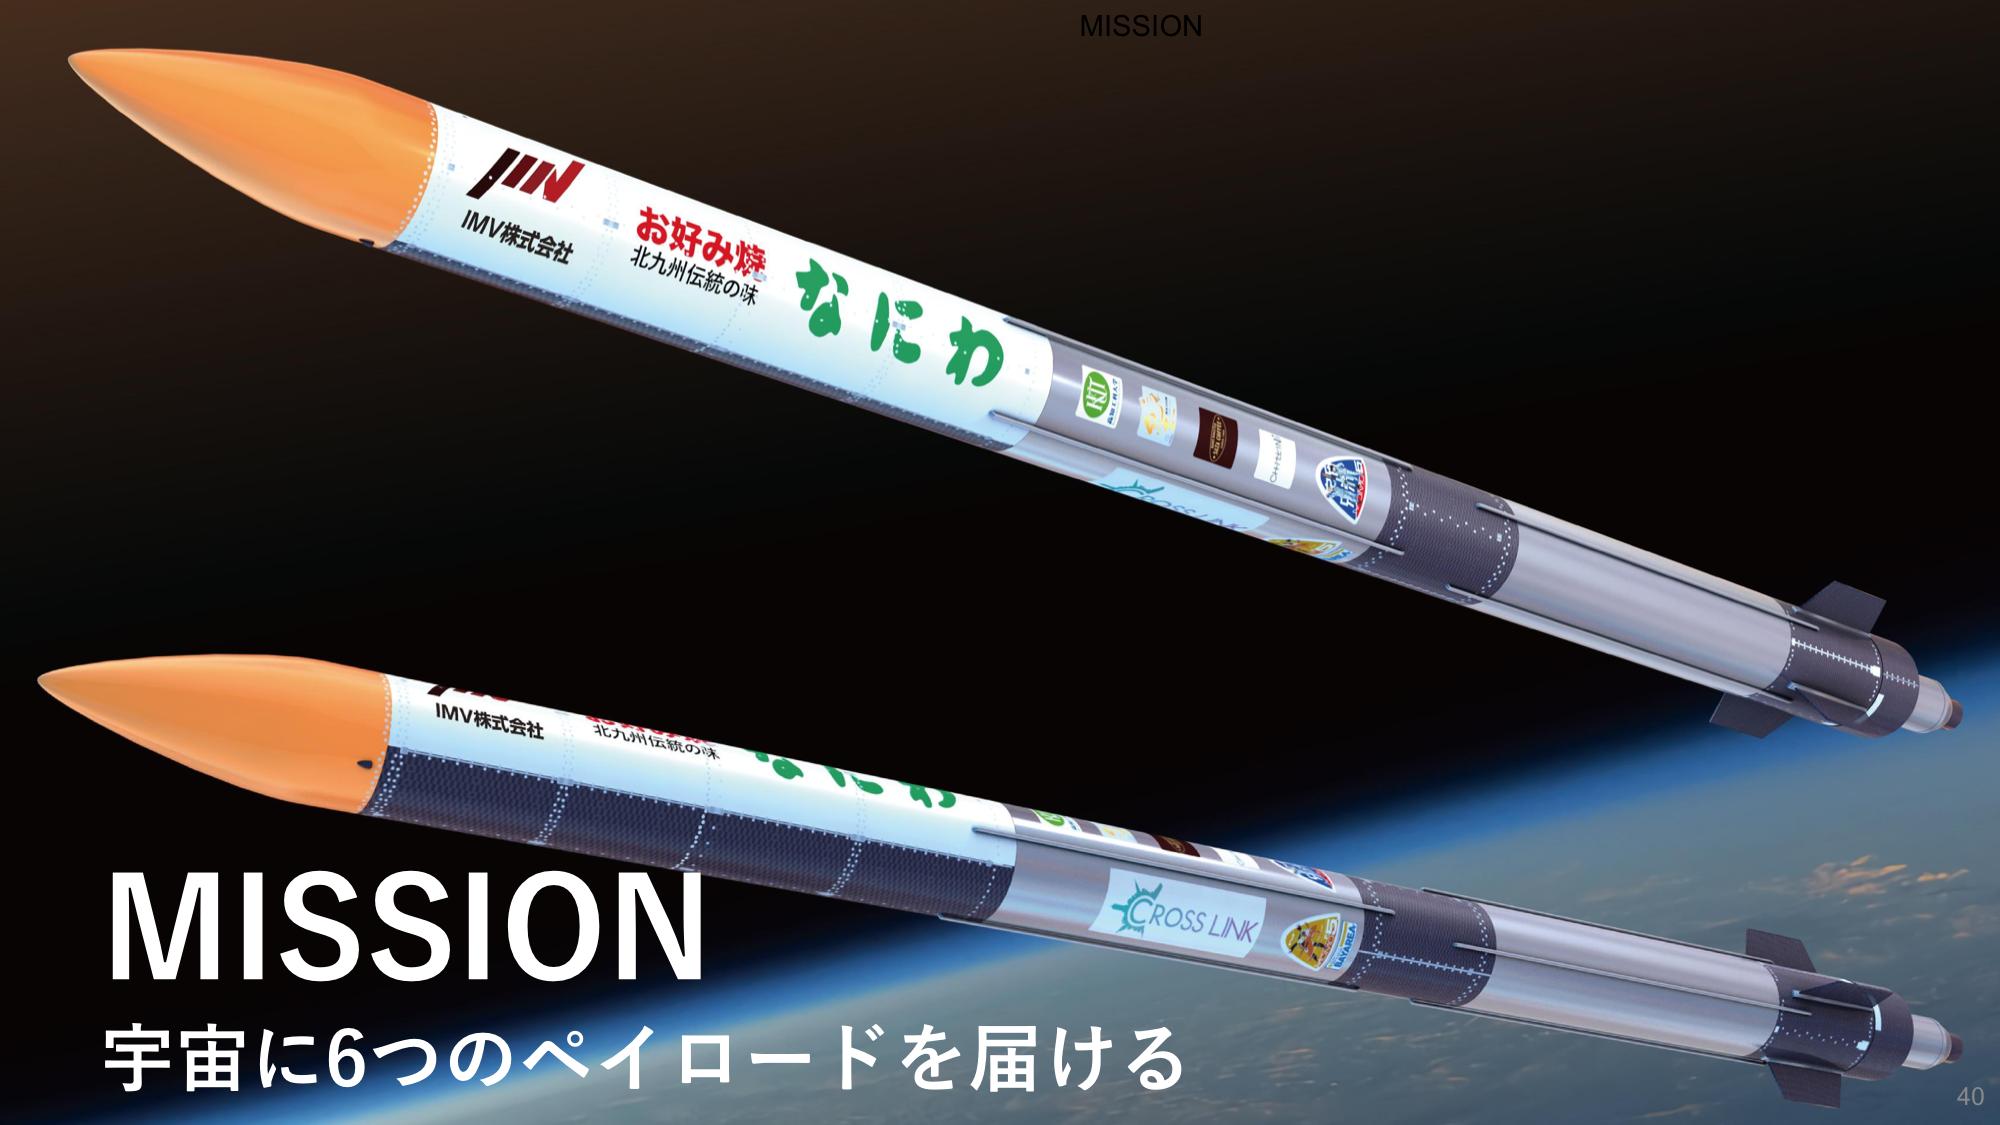 f:id:Imamura:20200603233126p:plain